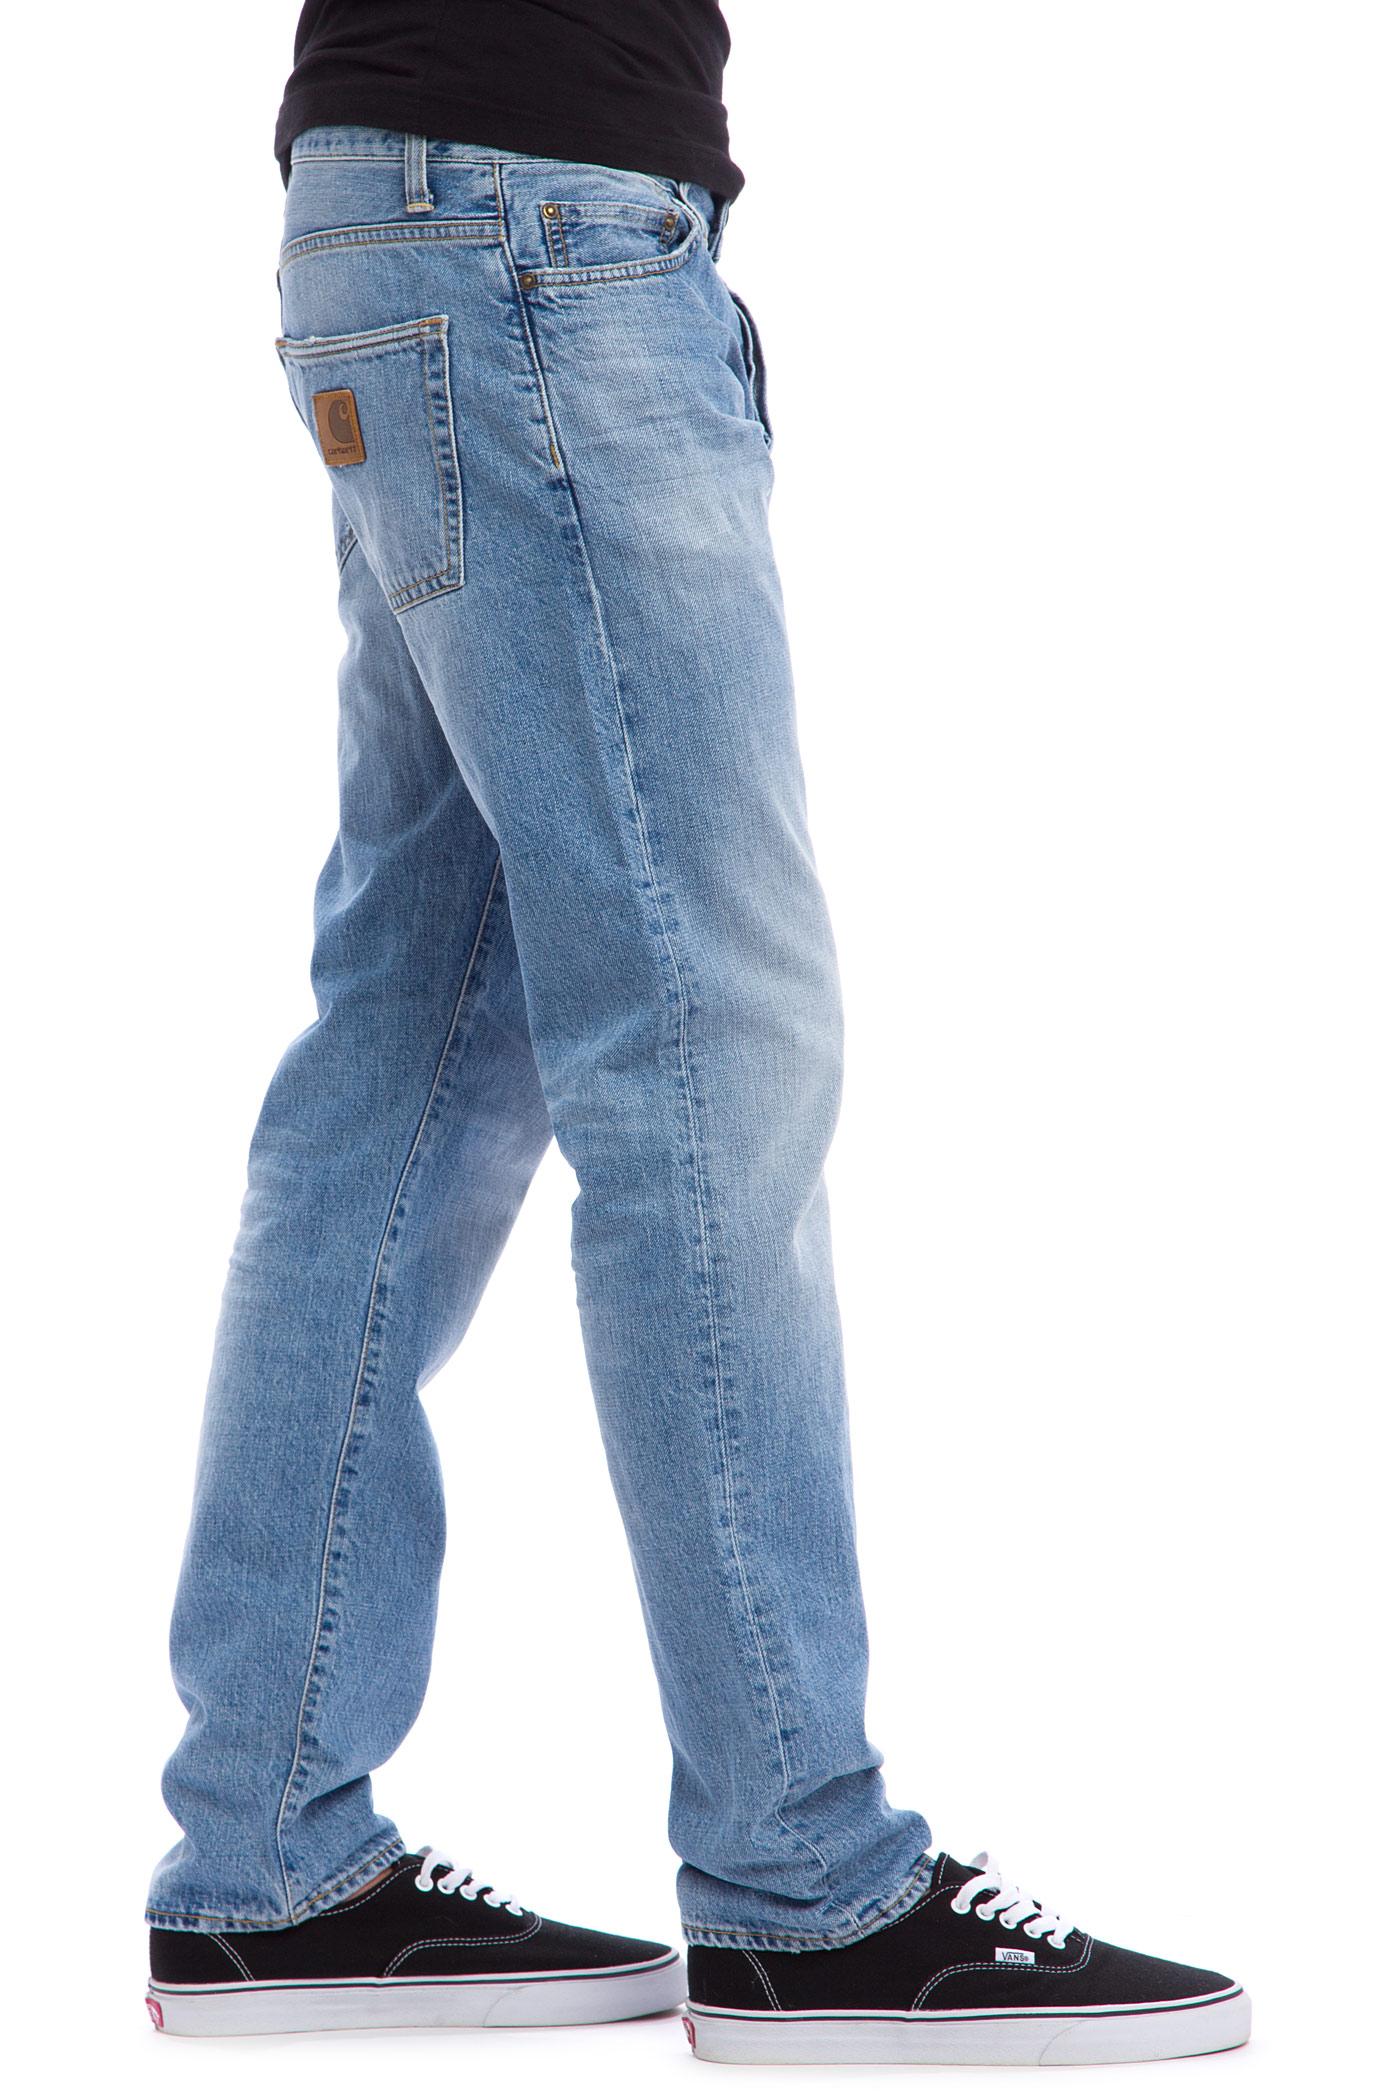 carhartt wip klondike pant edgewood jeans blue burst. Black Bedroom Furniture Sets. Home Design Ideas